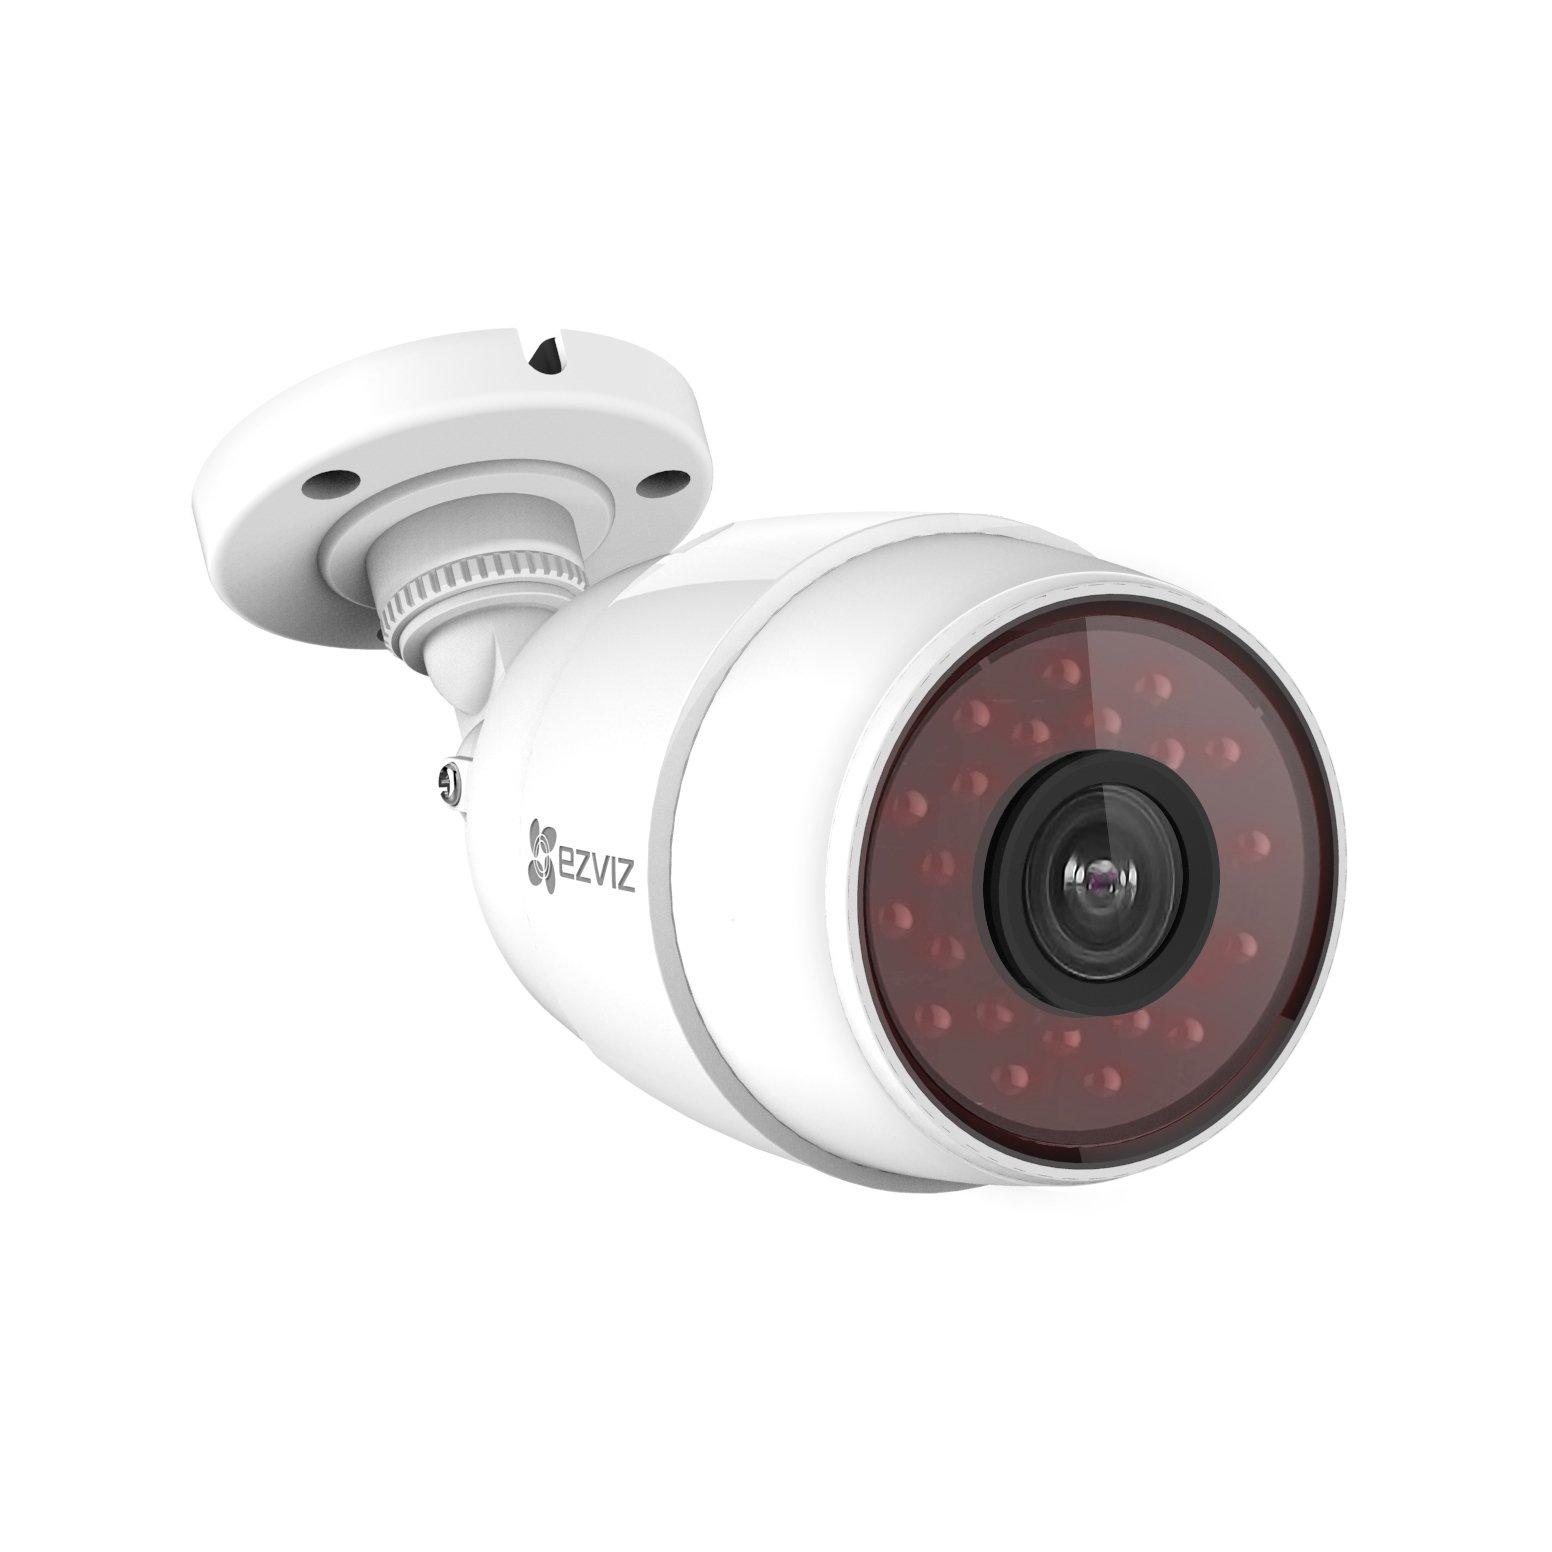 EZVIZ HuskyC HD 720p Outdoor Wi-Fi Video Security Bullet Camera, Works with Alexa, 100 ft. IR Night Vision, Weatherproof IP66